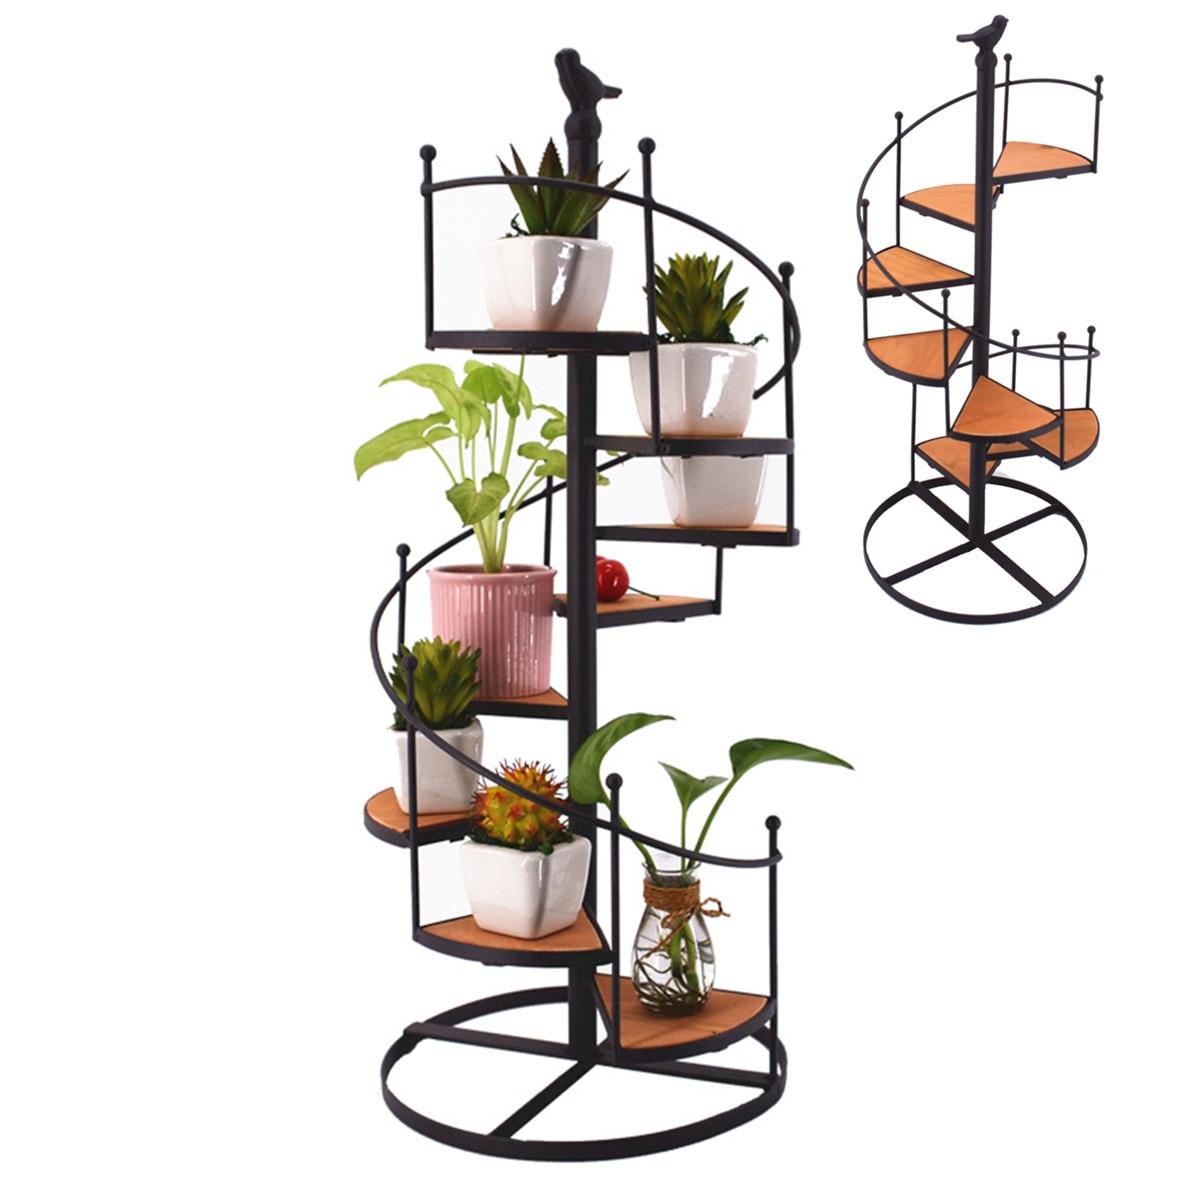 8 Layer Staircase Iron Plant Rack Metal Stand Plants Succulent Shelf Desktop Garden Flower Modern Decorative With Wood Plates